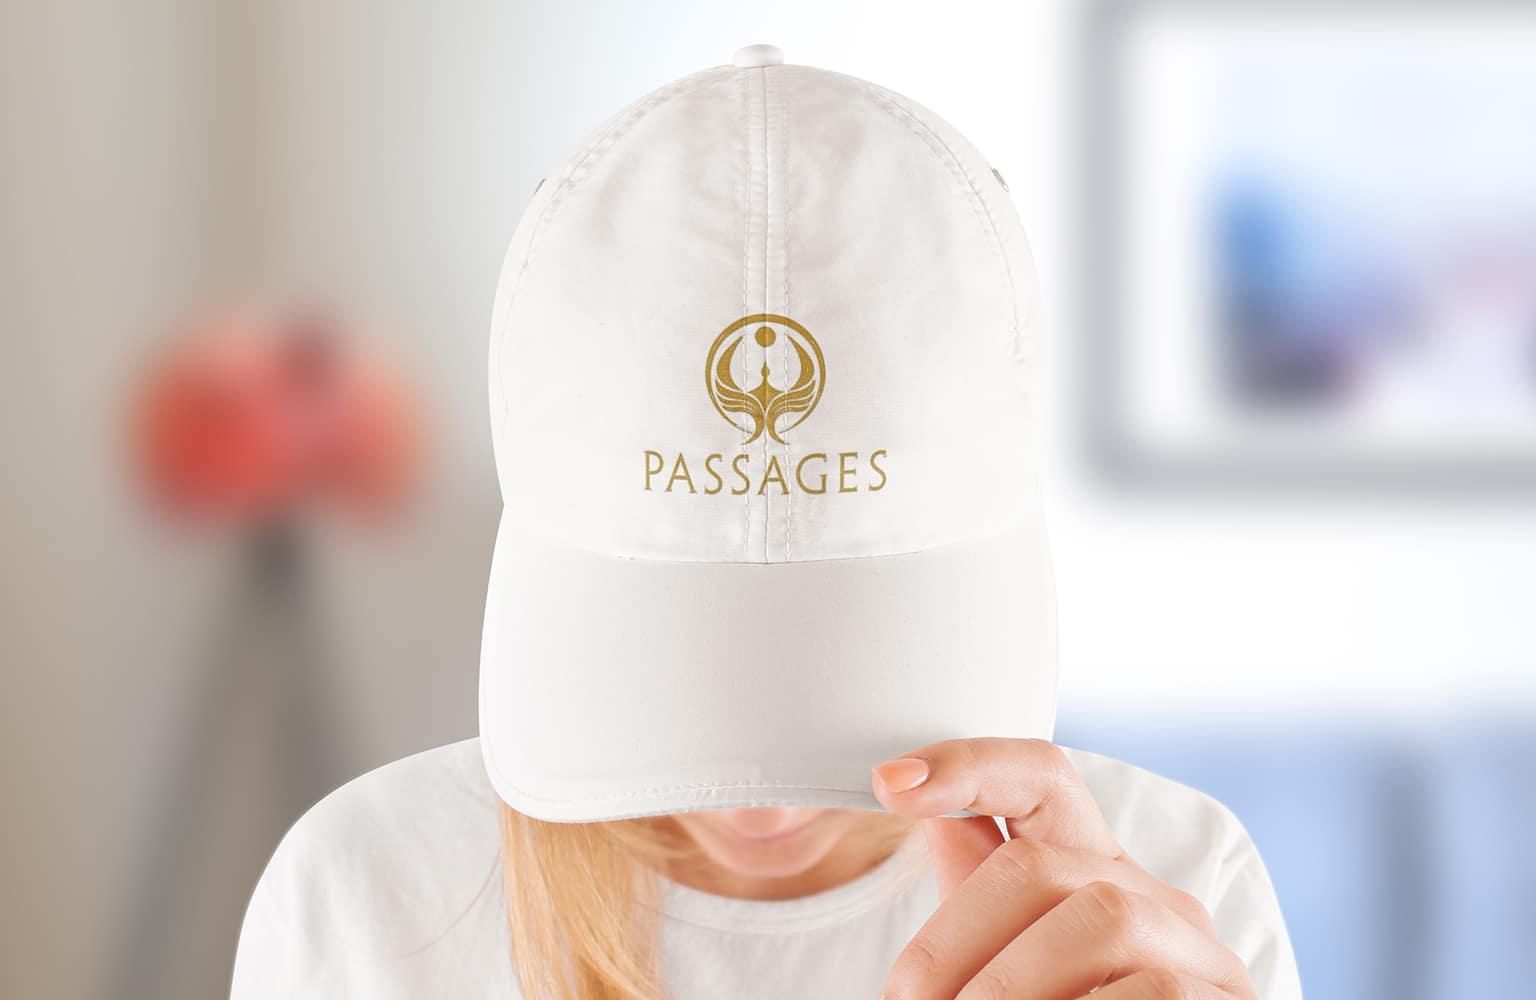 Passages Wellness Store